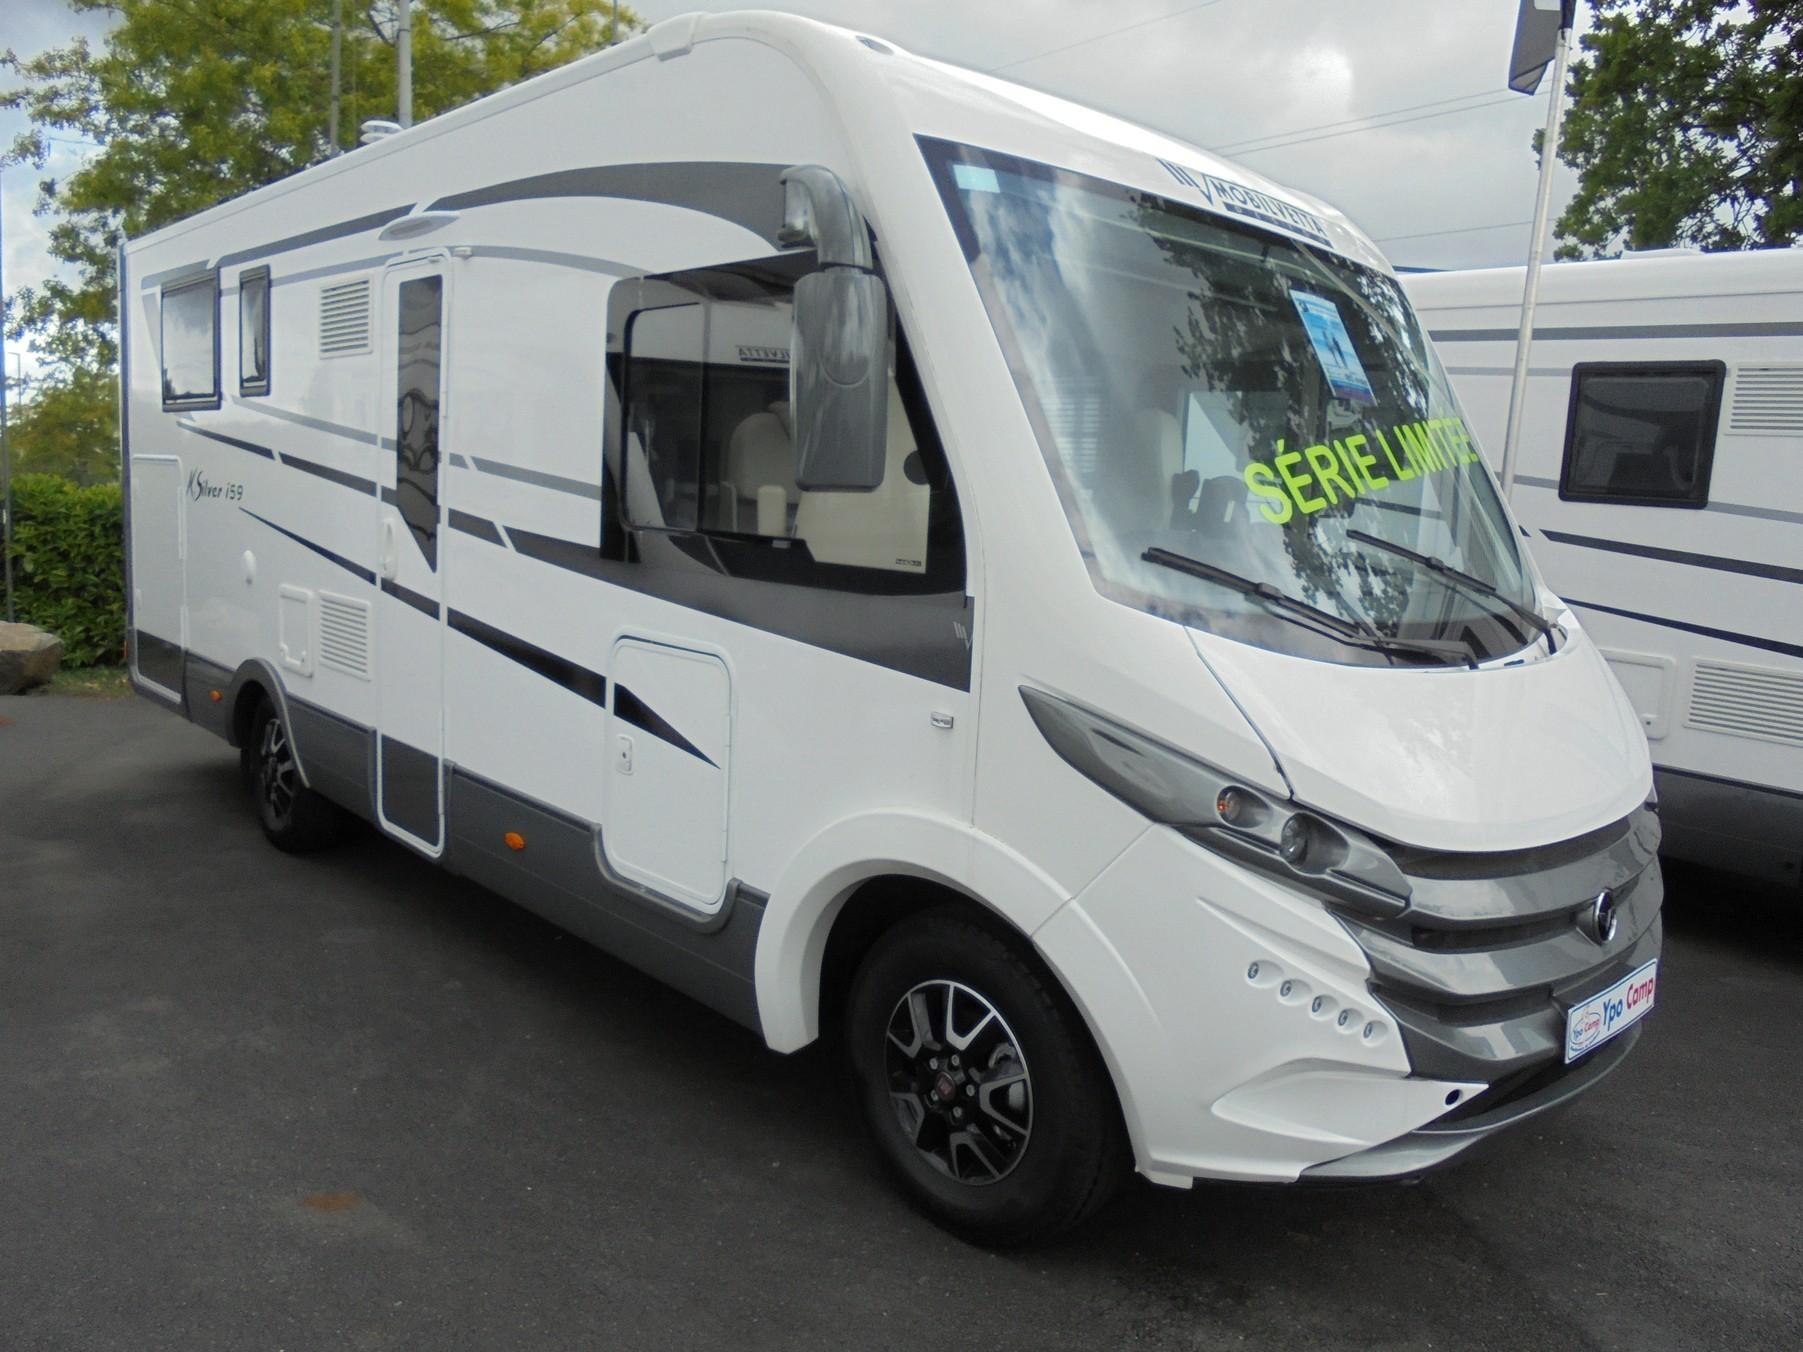 mobilvetta k silver i 59 neuf fiat camping car en vente treillieres loire atlantique 44. Black Bedroom Furniture Sets. Home Design Ideas